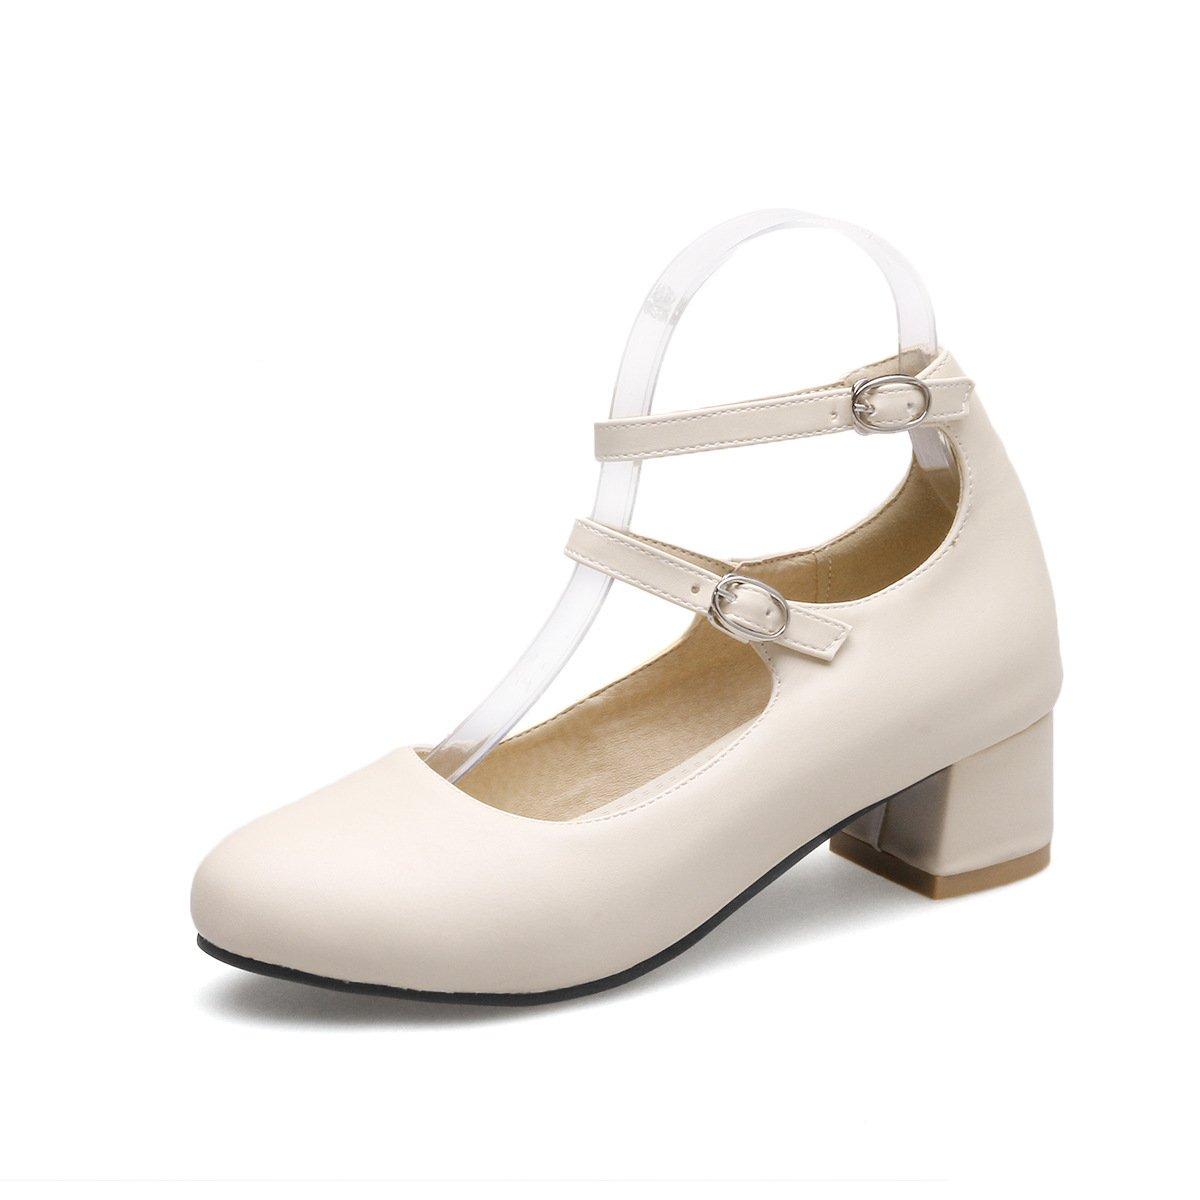 Mei&S Puntera Redonda Mujer Tacones Bloque Boca Superficial Zapatos 39 EU